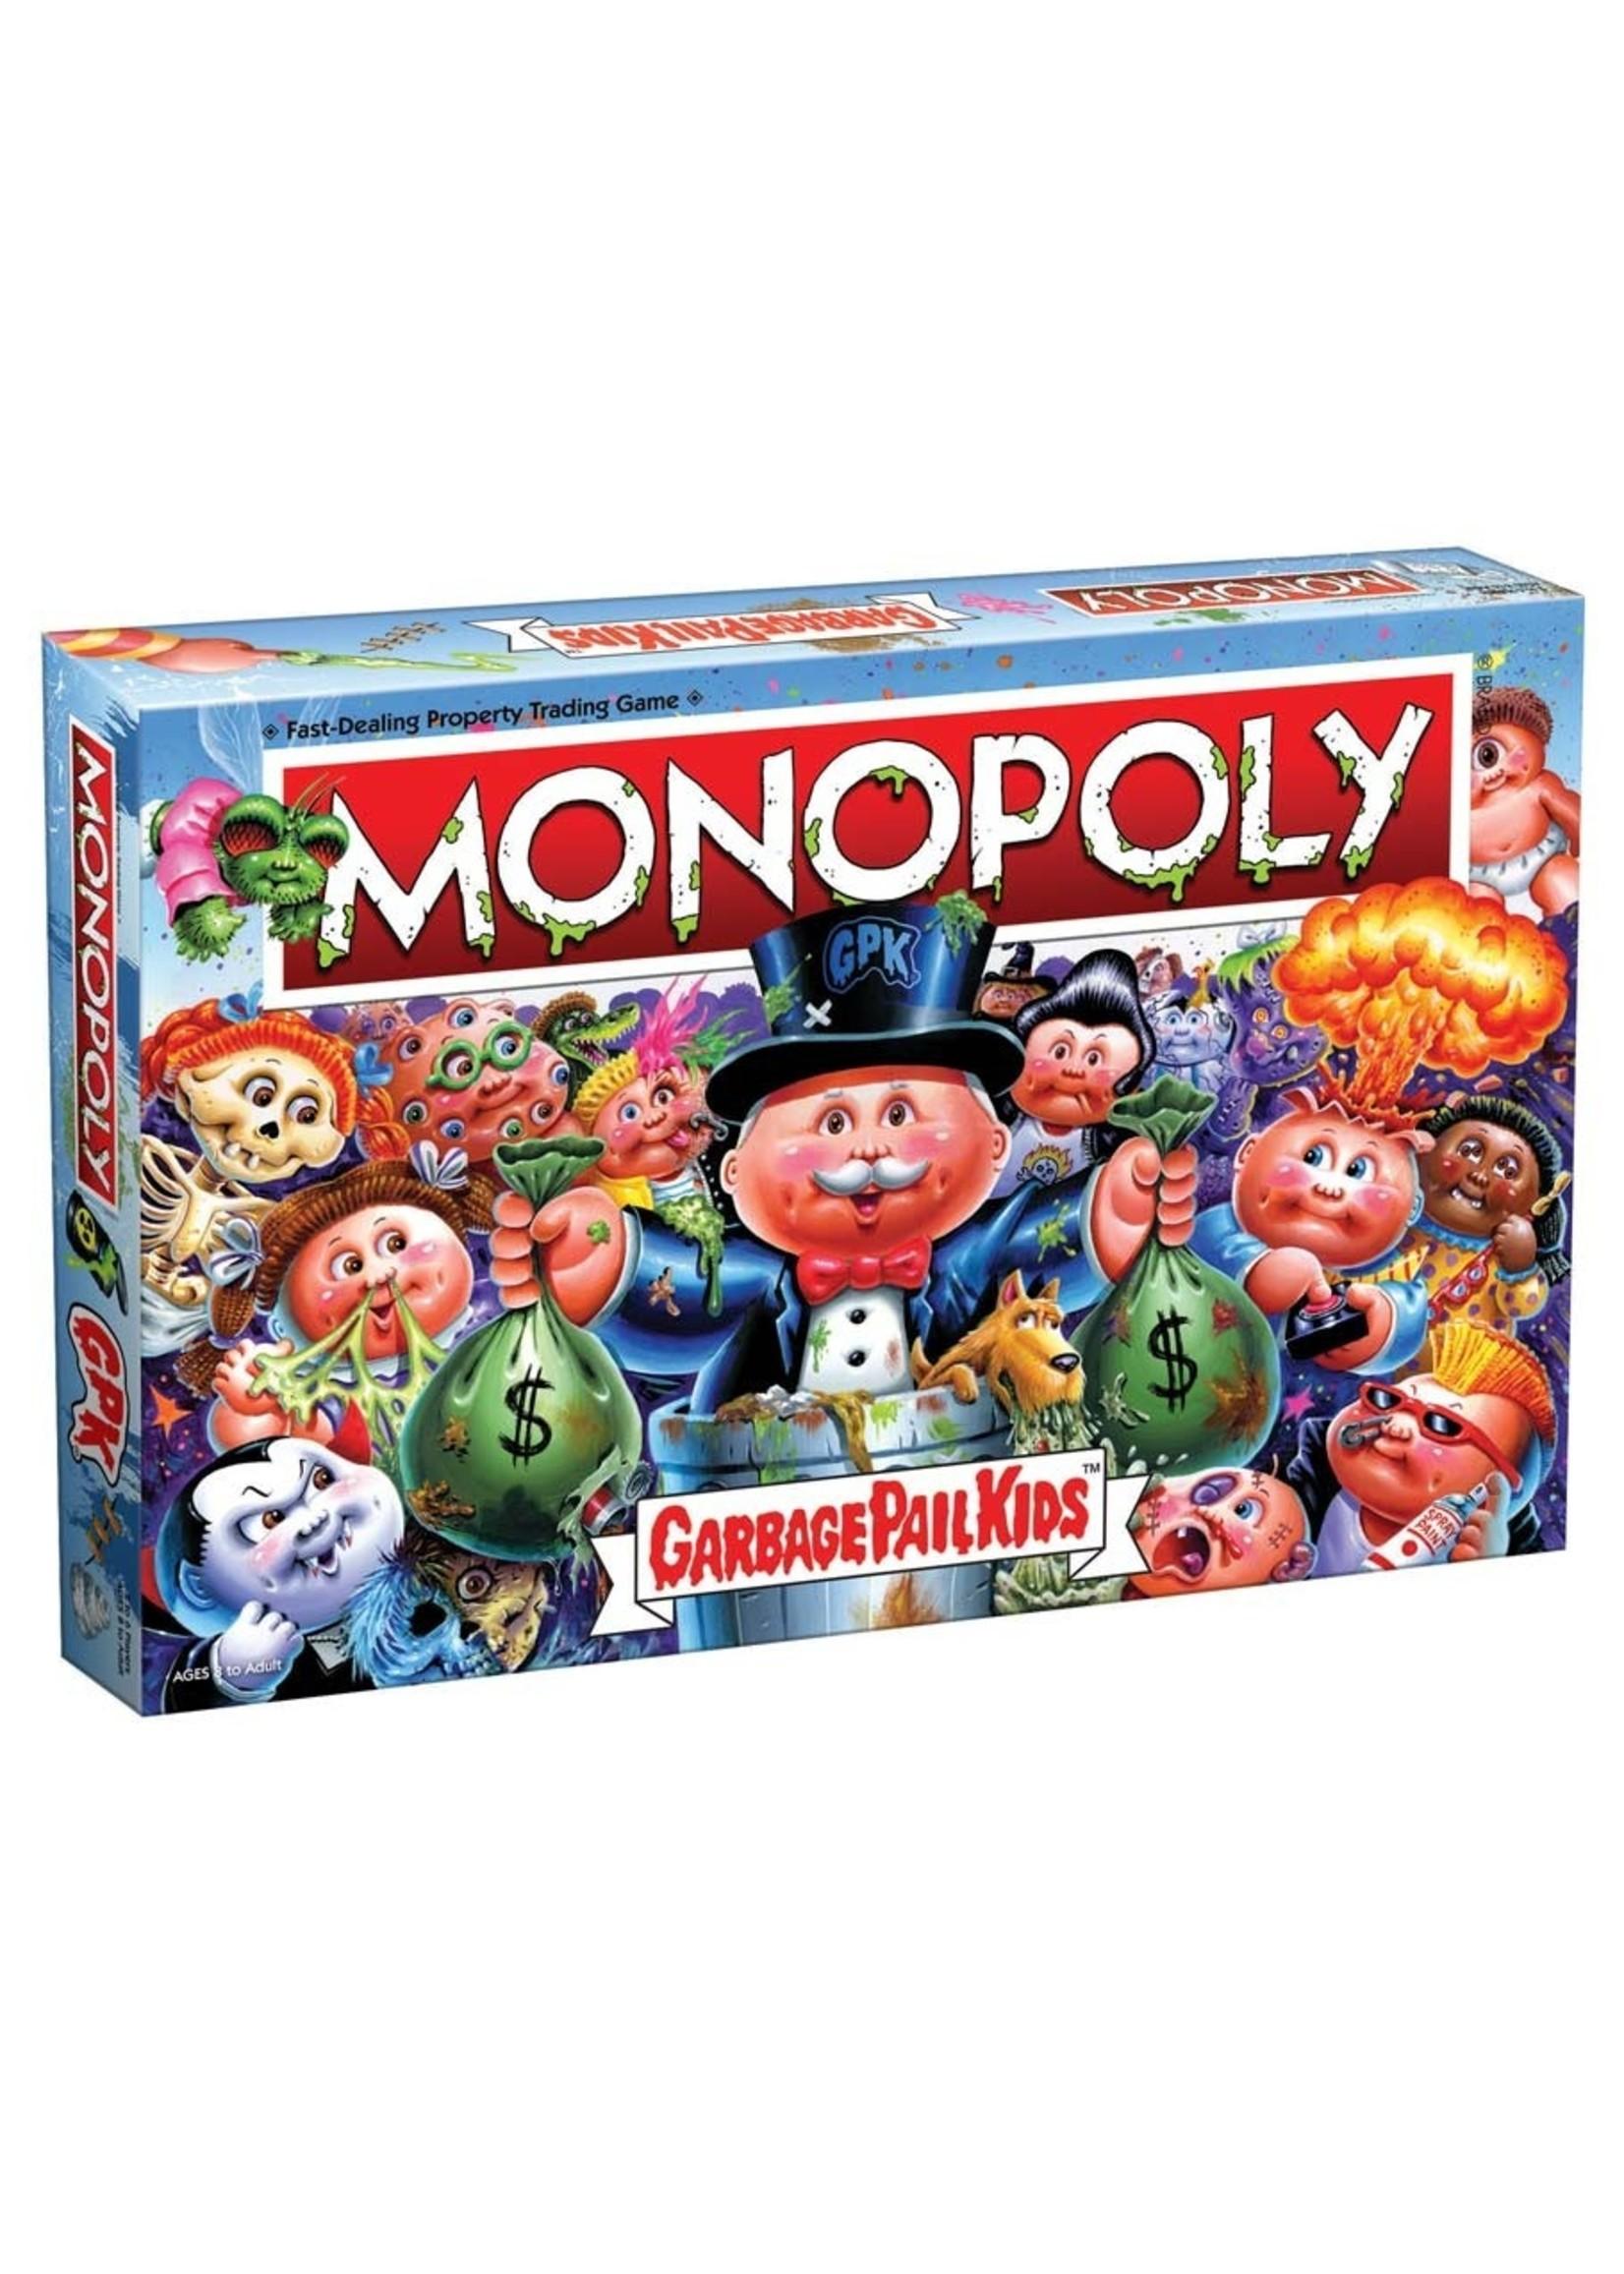 The OP Games Monopoly - Garbage Pail Kids